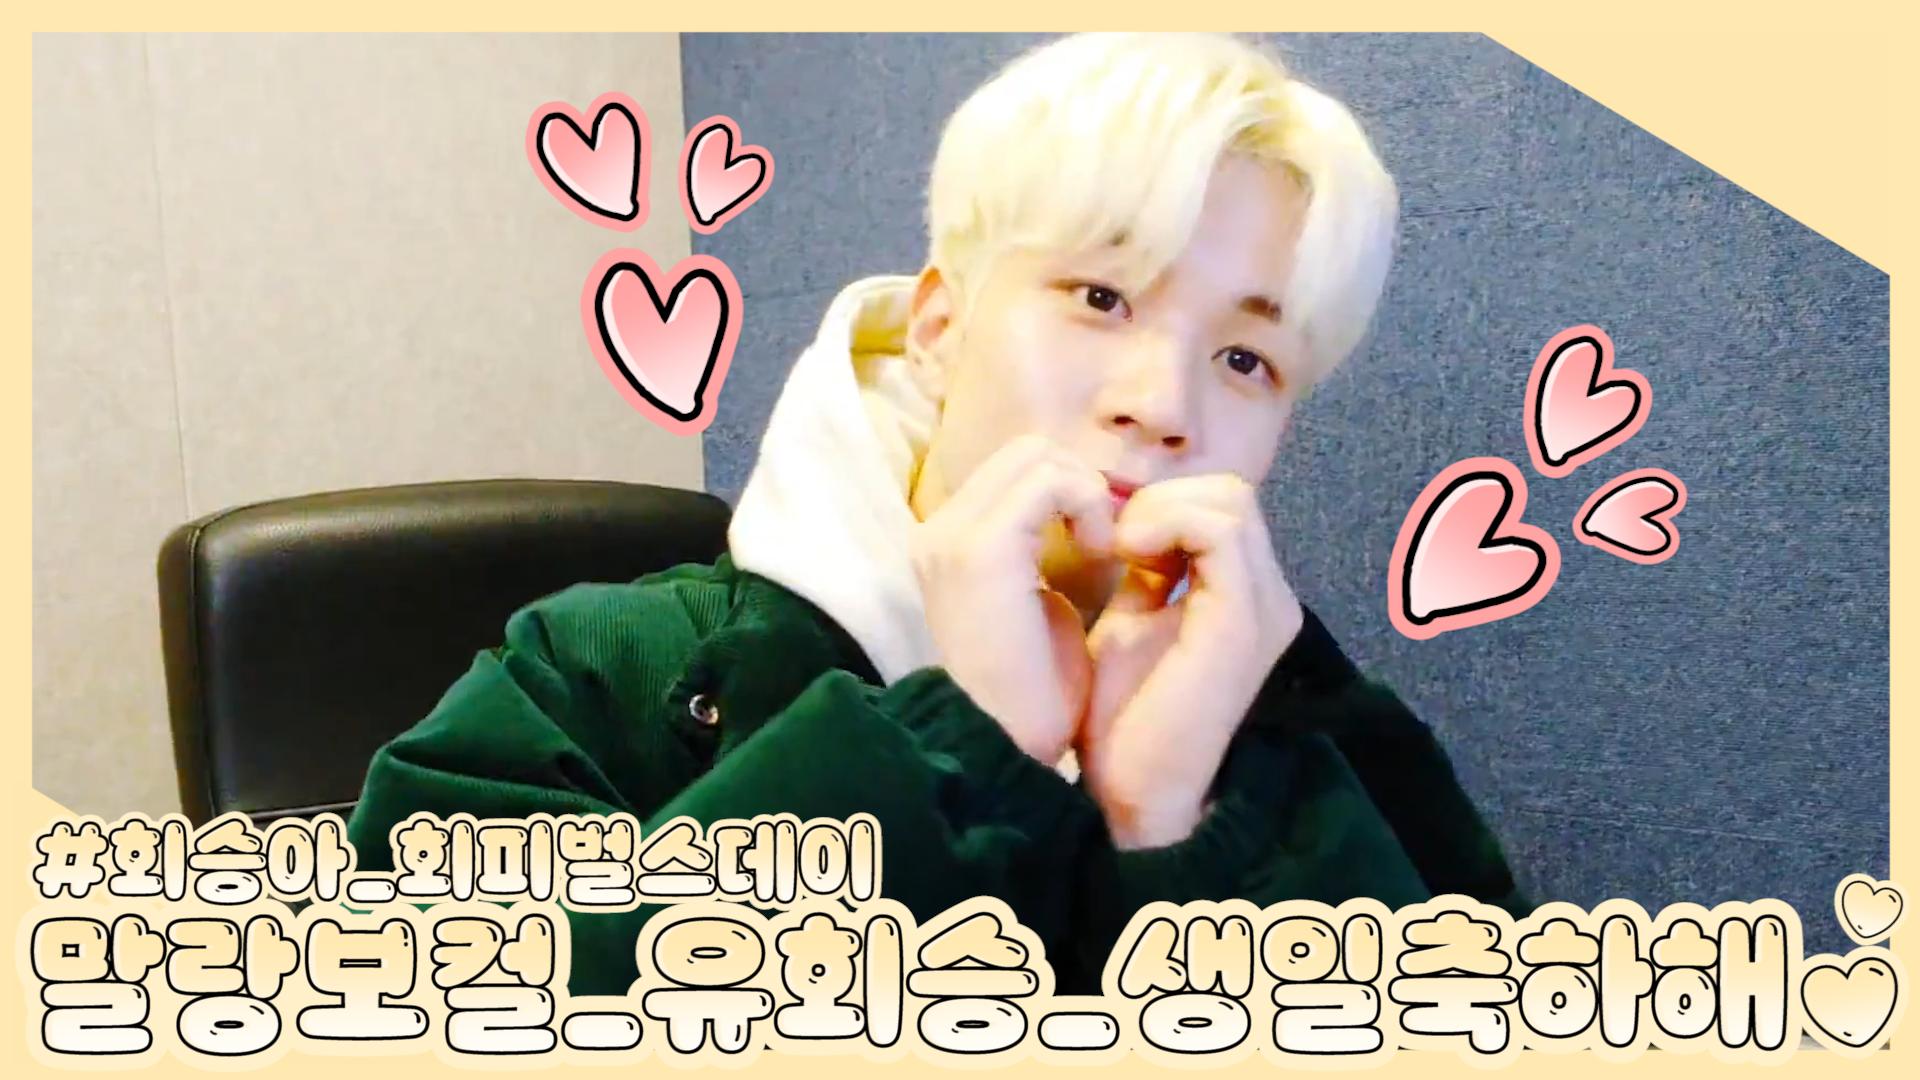 [N.Flying] 🎊💗삼만랑하는 말랑보컬 회승아 회피벌스데이 투 유🎂🎊 (HAPPY HWESEUNG DAY!)